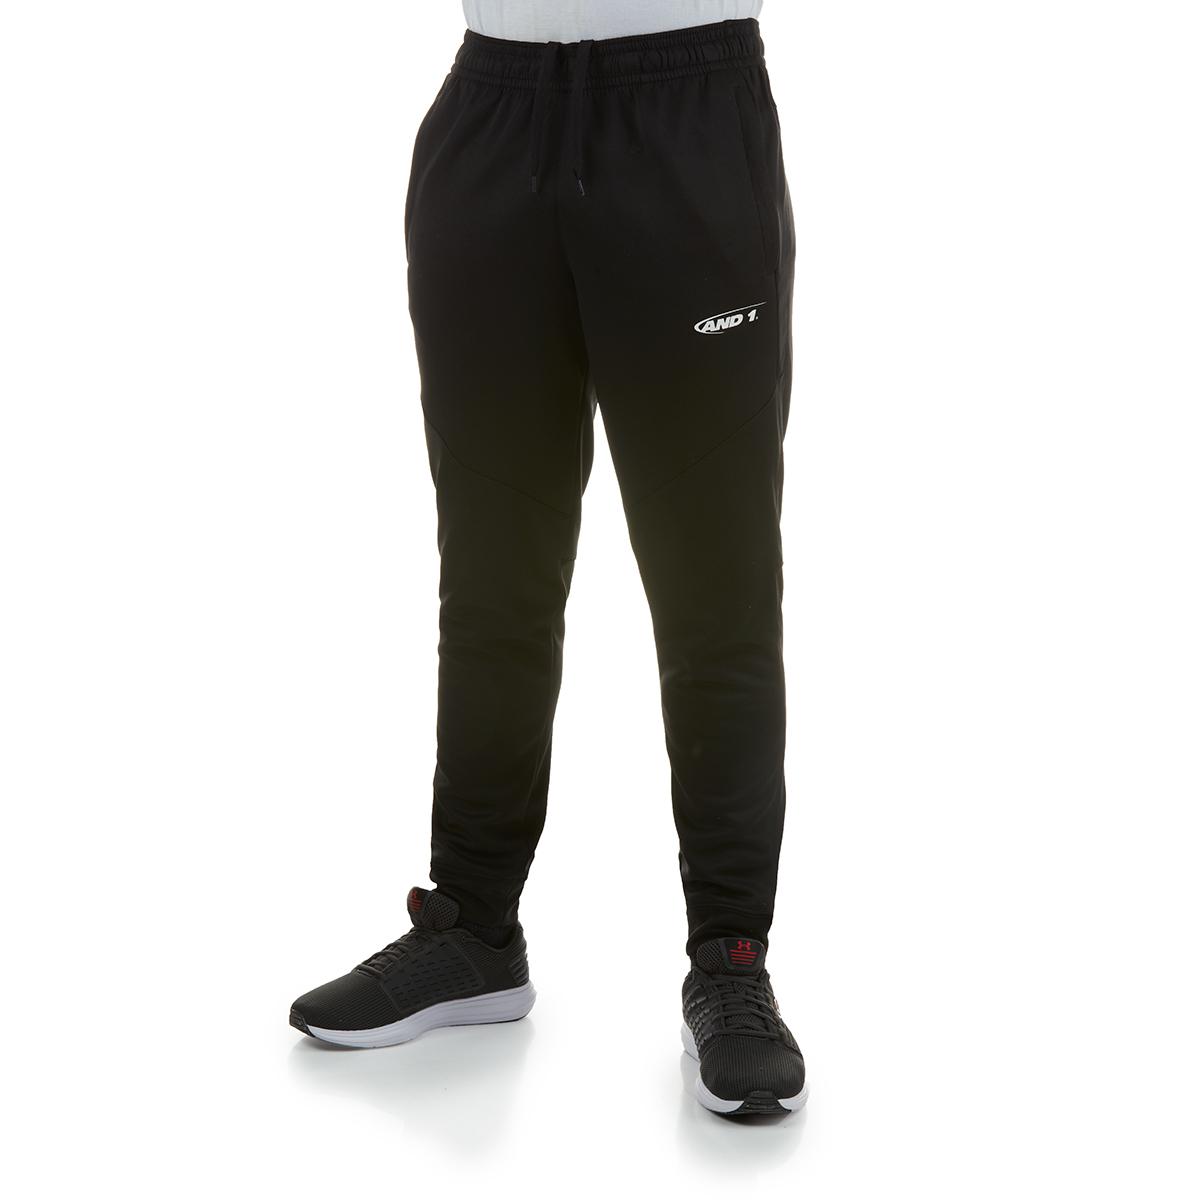 And1 Men's Tricot Jogger Pants - Black, M